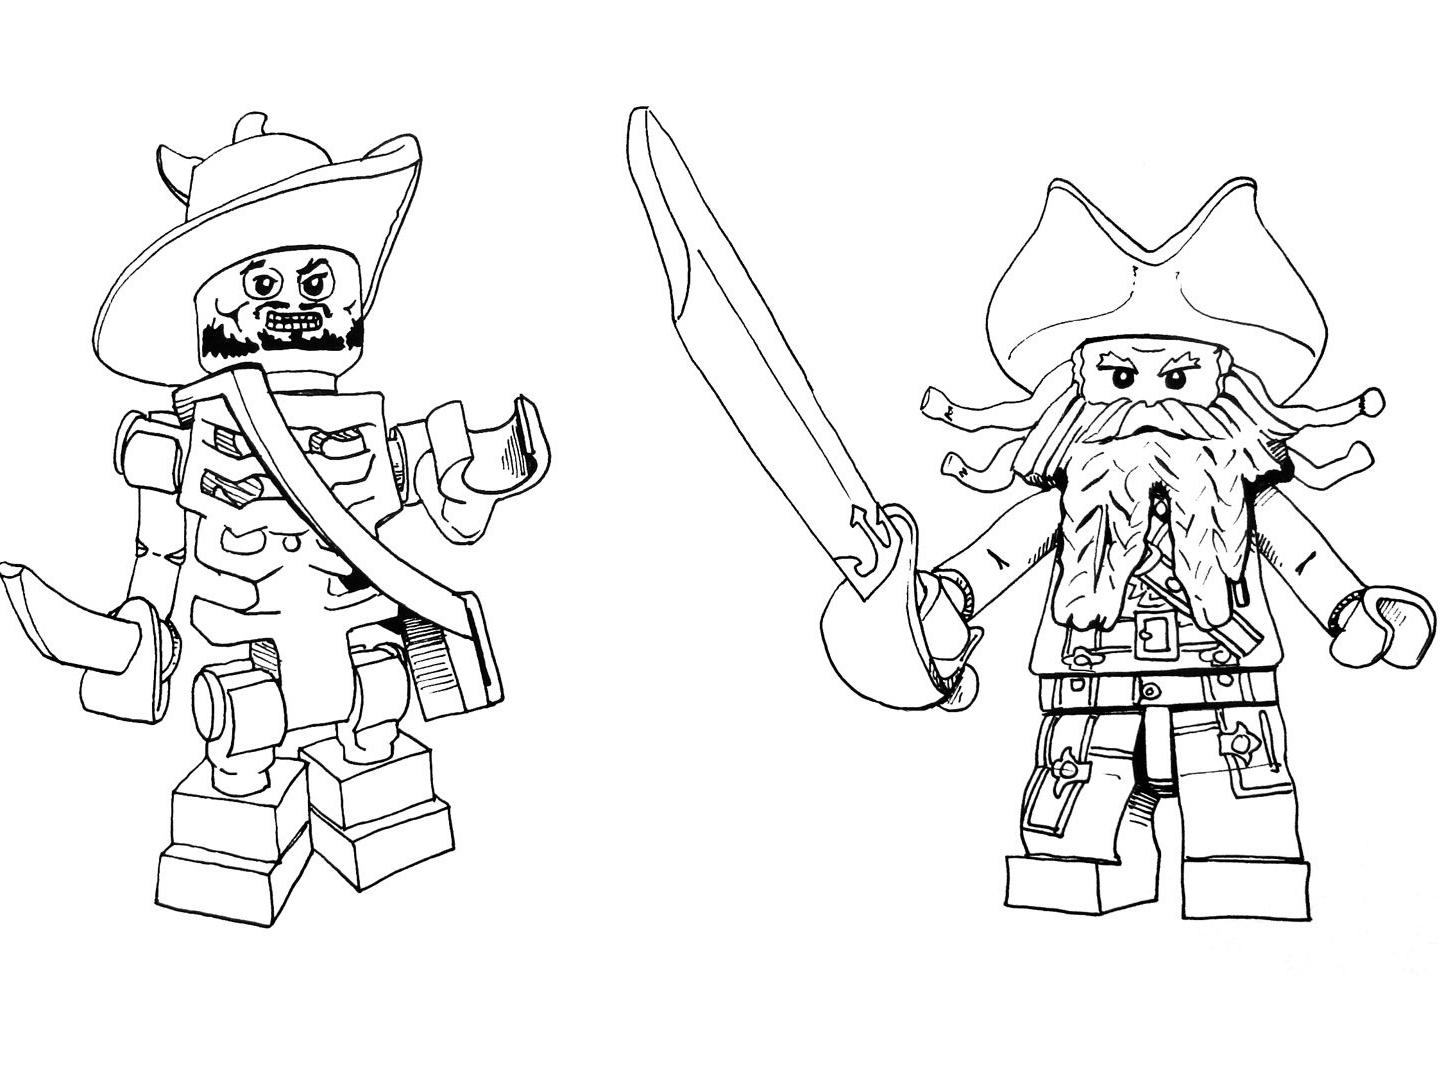 127 Dessins De Coloriage Pirates Des Caraïbes À Imprimer concernant Dessin A Imprimer De Pirate